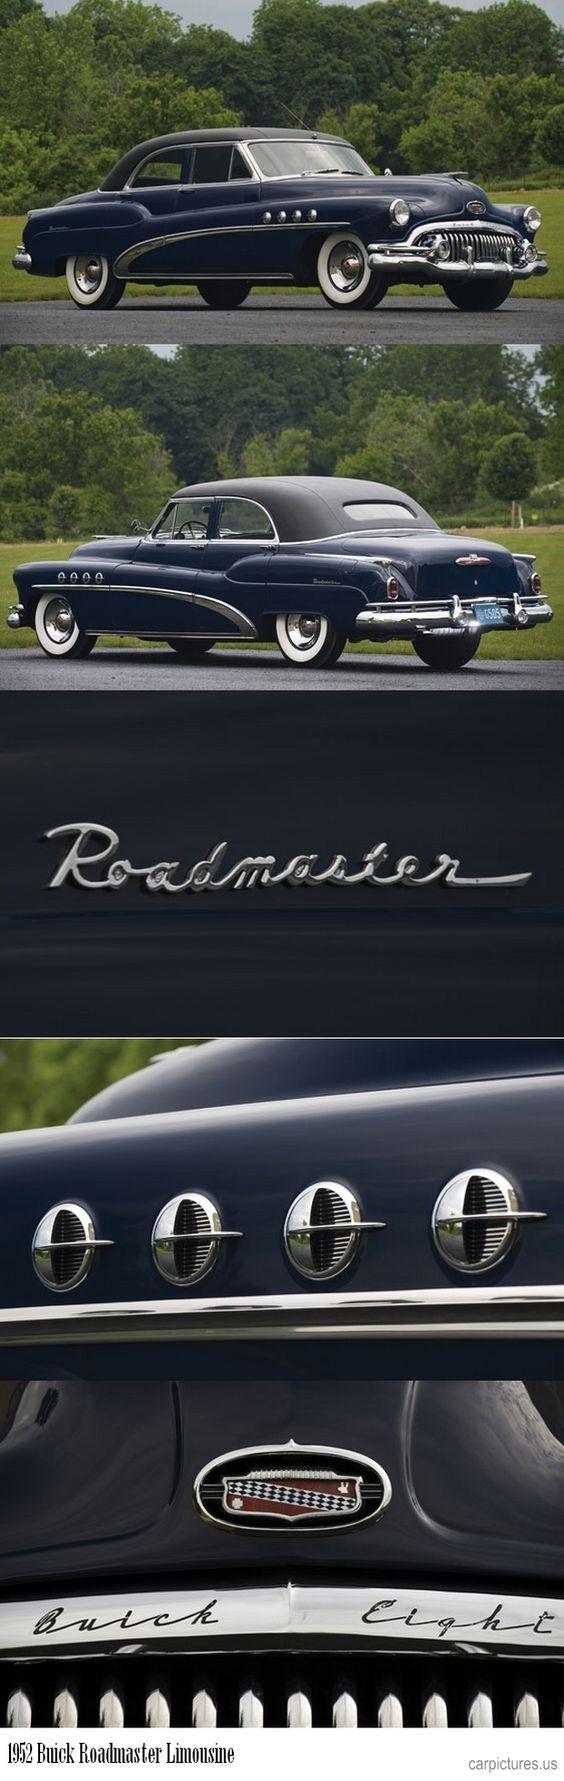 1952 Buick Roadmaster Limousine. http://carpictures.us